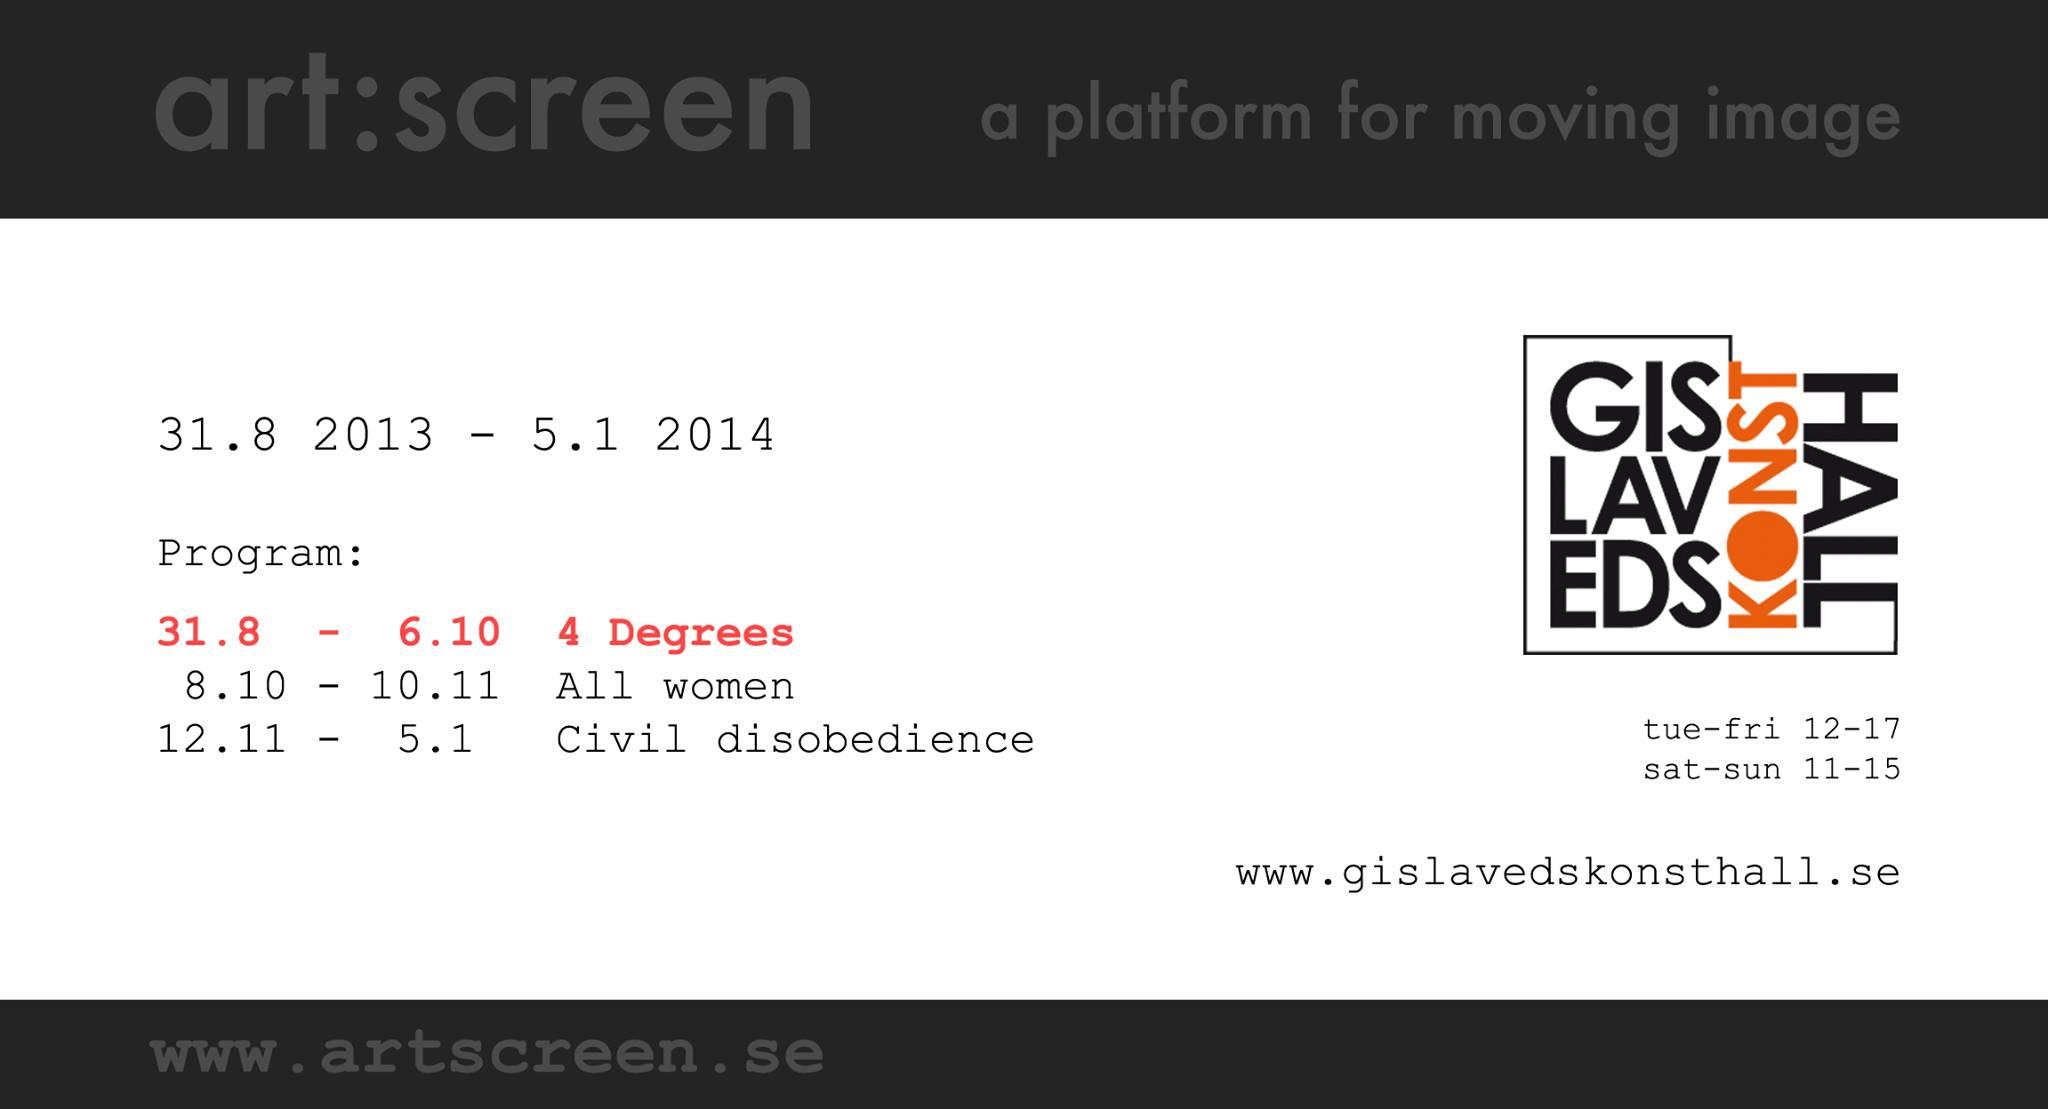 Monika K. Adler: All about Women - Artscreen Sweden